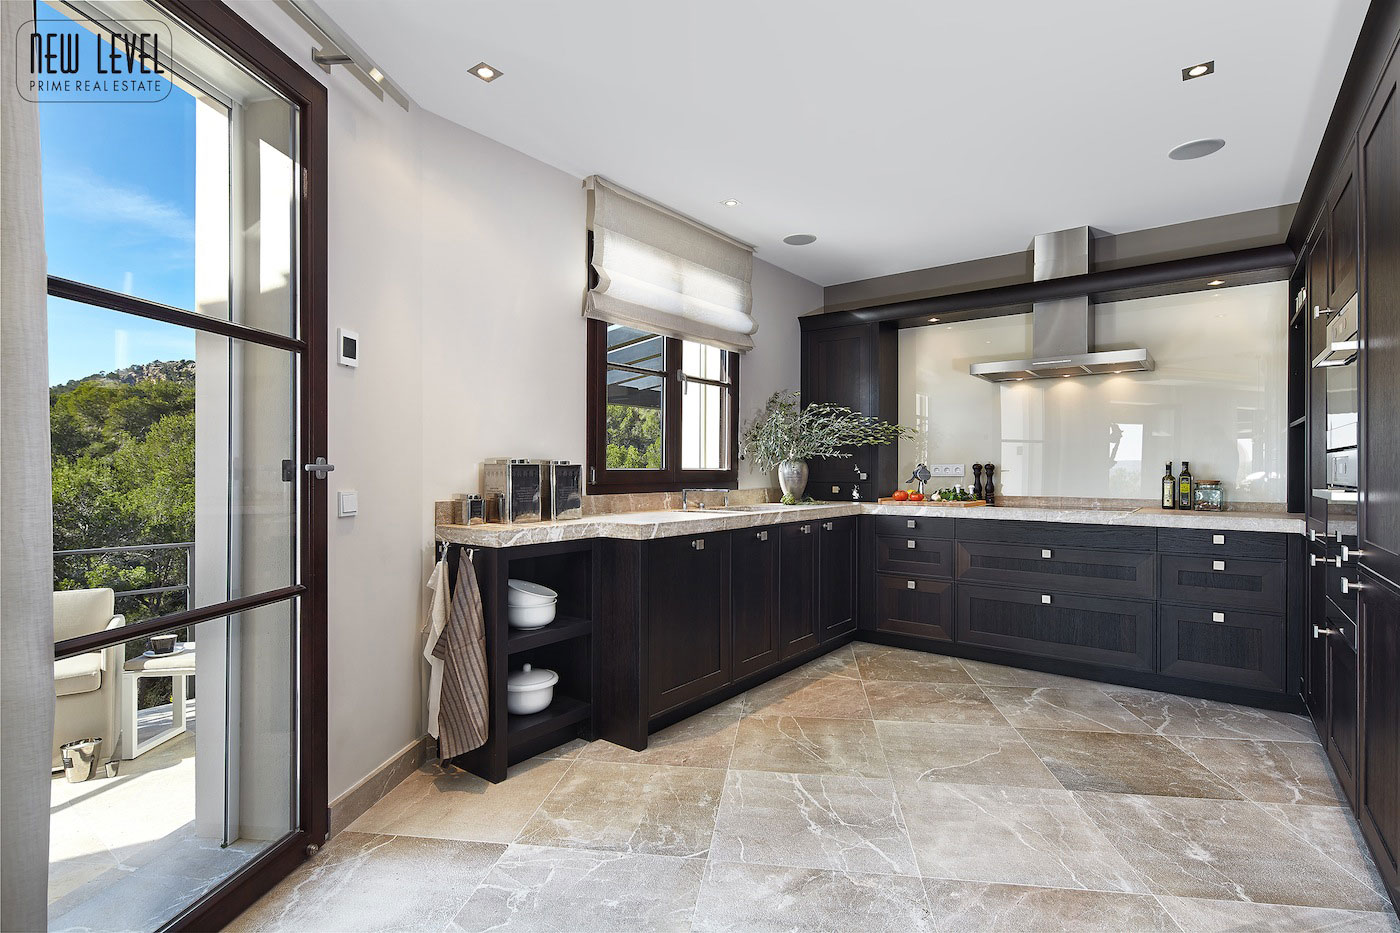 Dark Wood Kitchen, Contrasting Marble Floor Tiles, Fabulous Villa in Puerto de Andratx, Mallorca